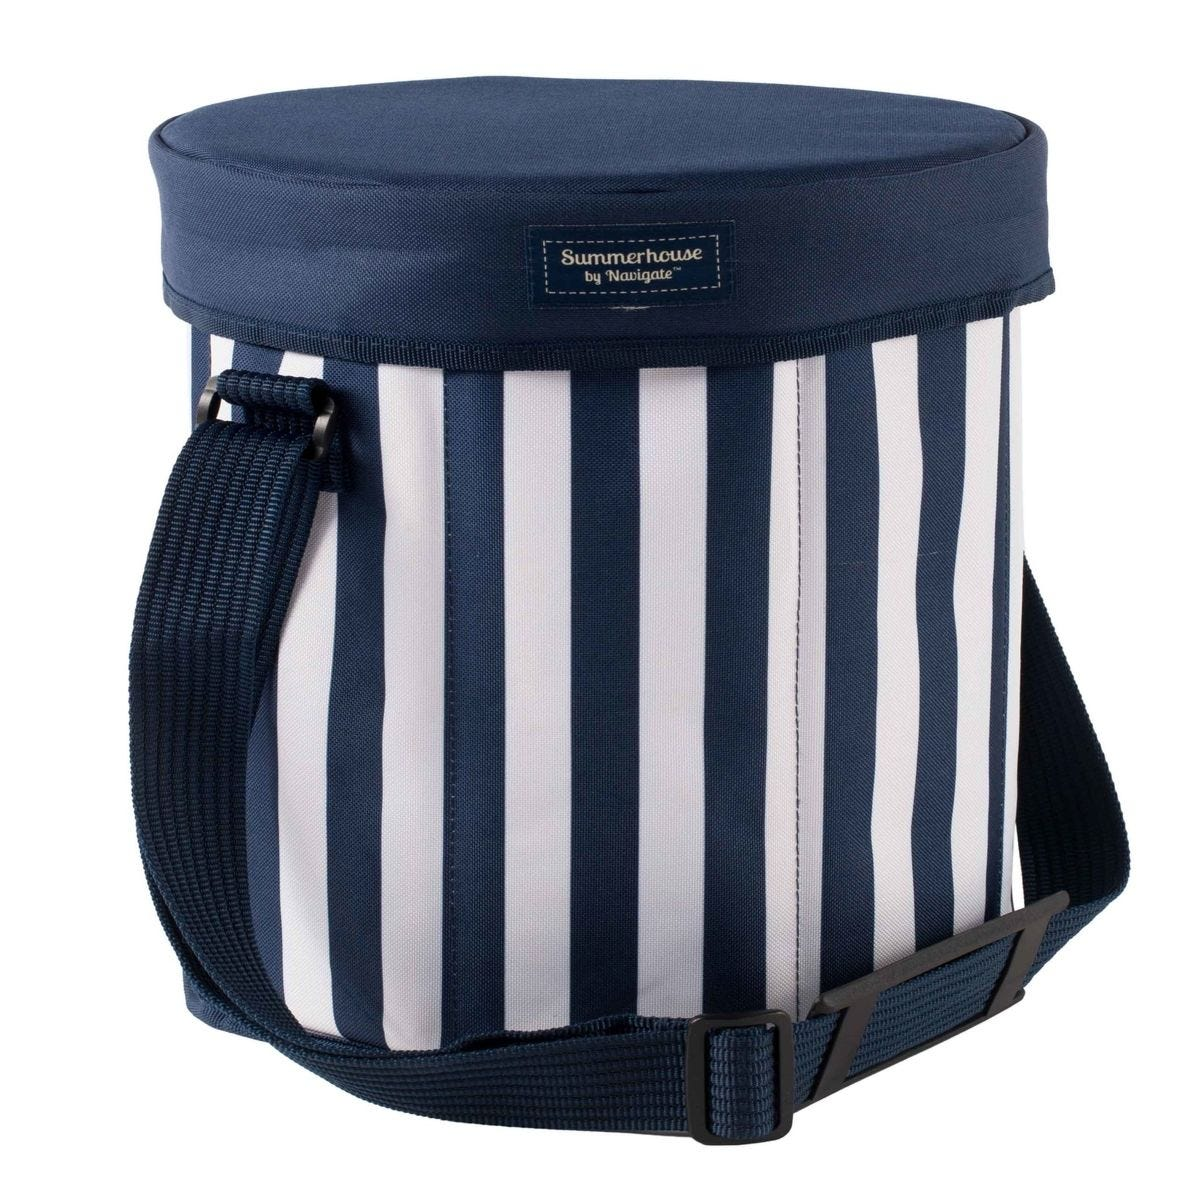 Summerhouse Coast Stripe 15L Seat Cooler - Navy & White